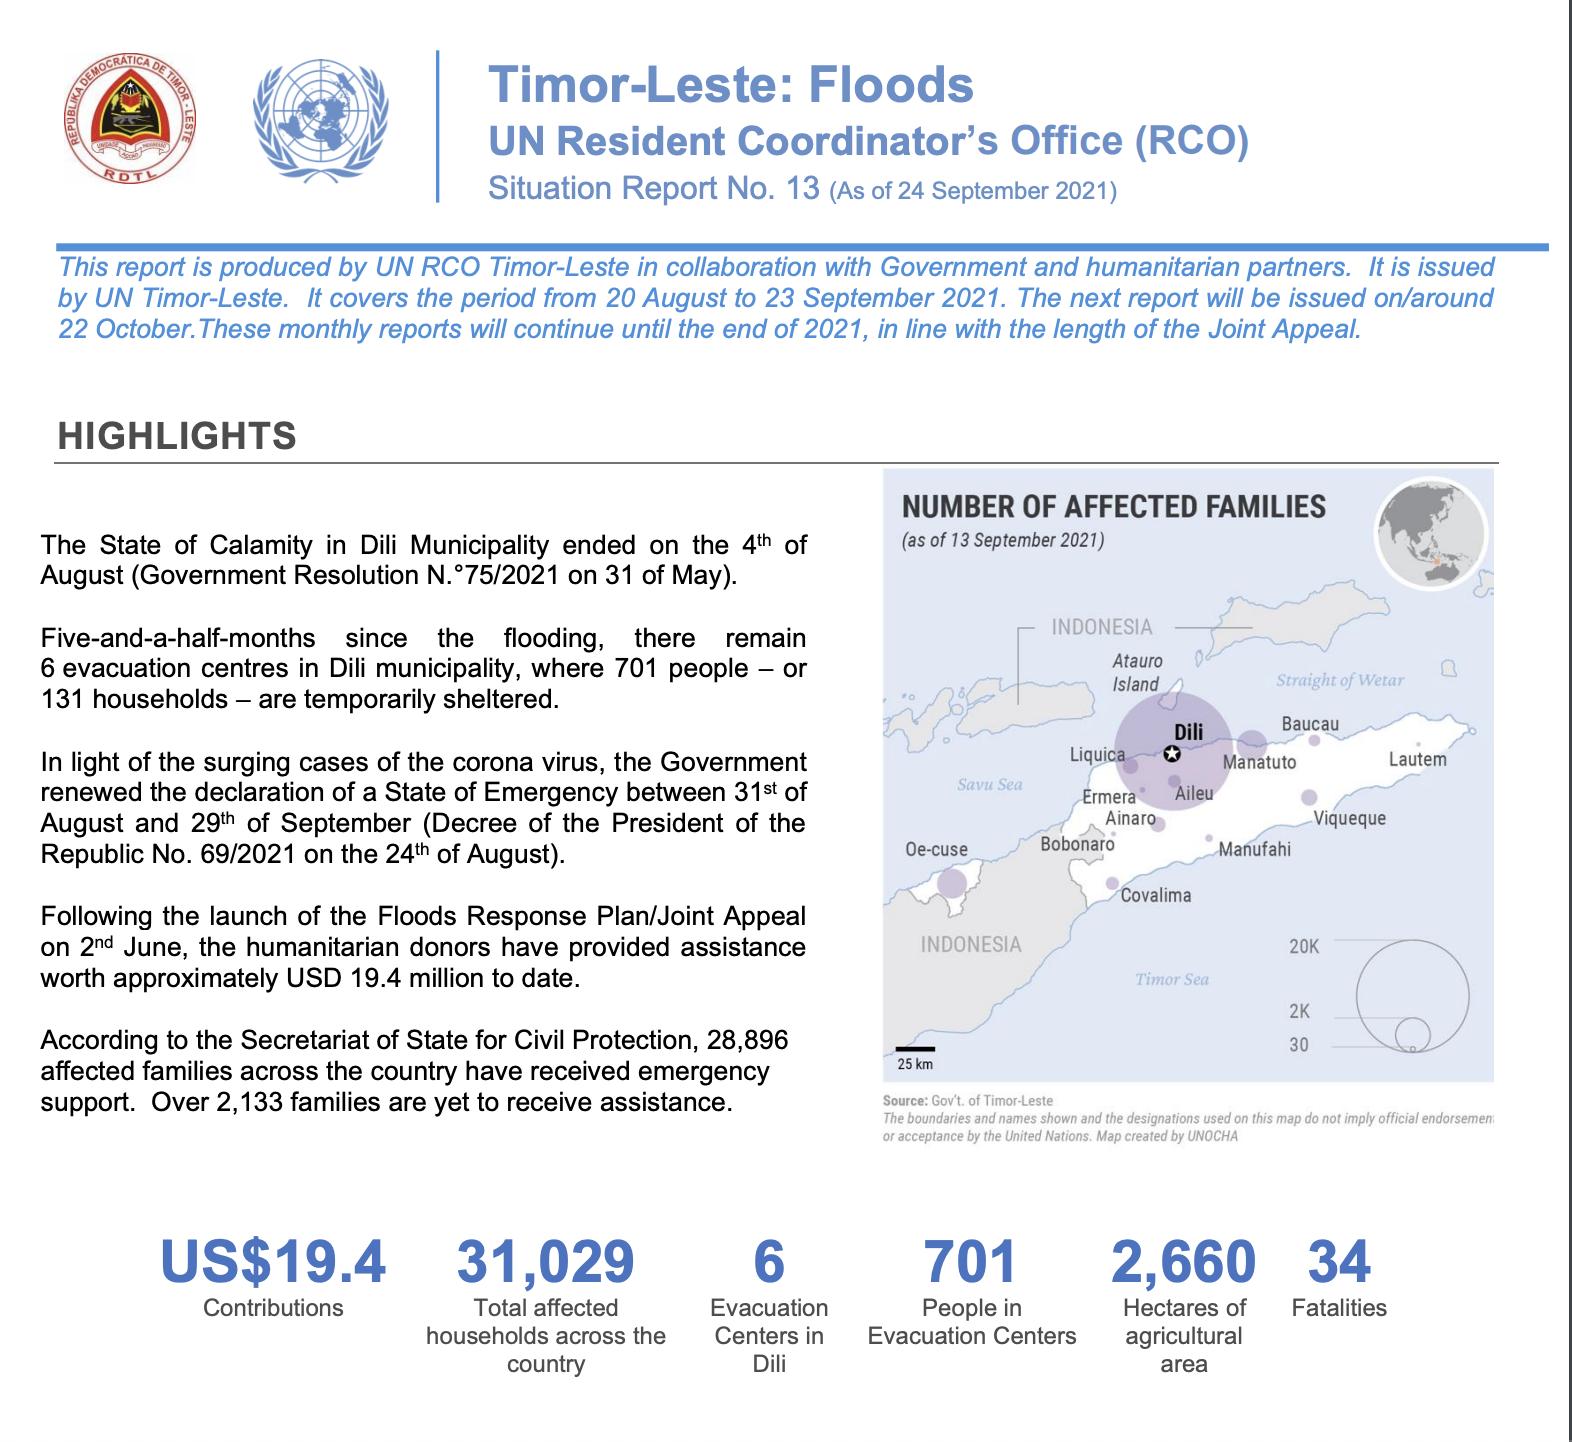 Timor-Leste Flood Response Situation Report No. 13 (24 September 2021)